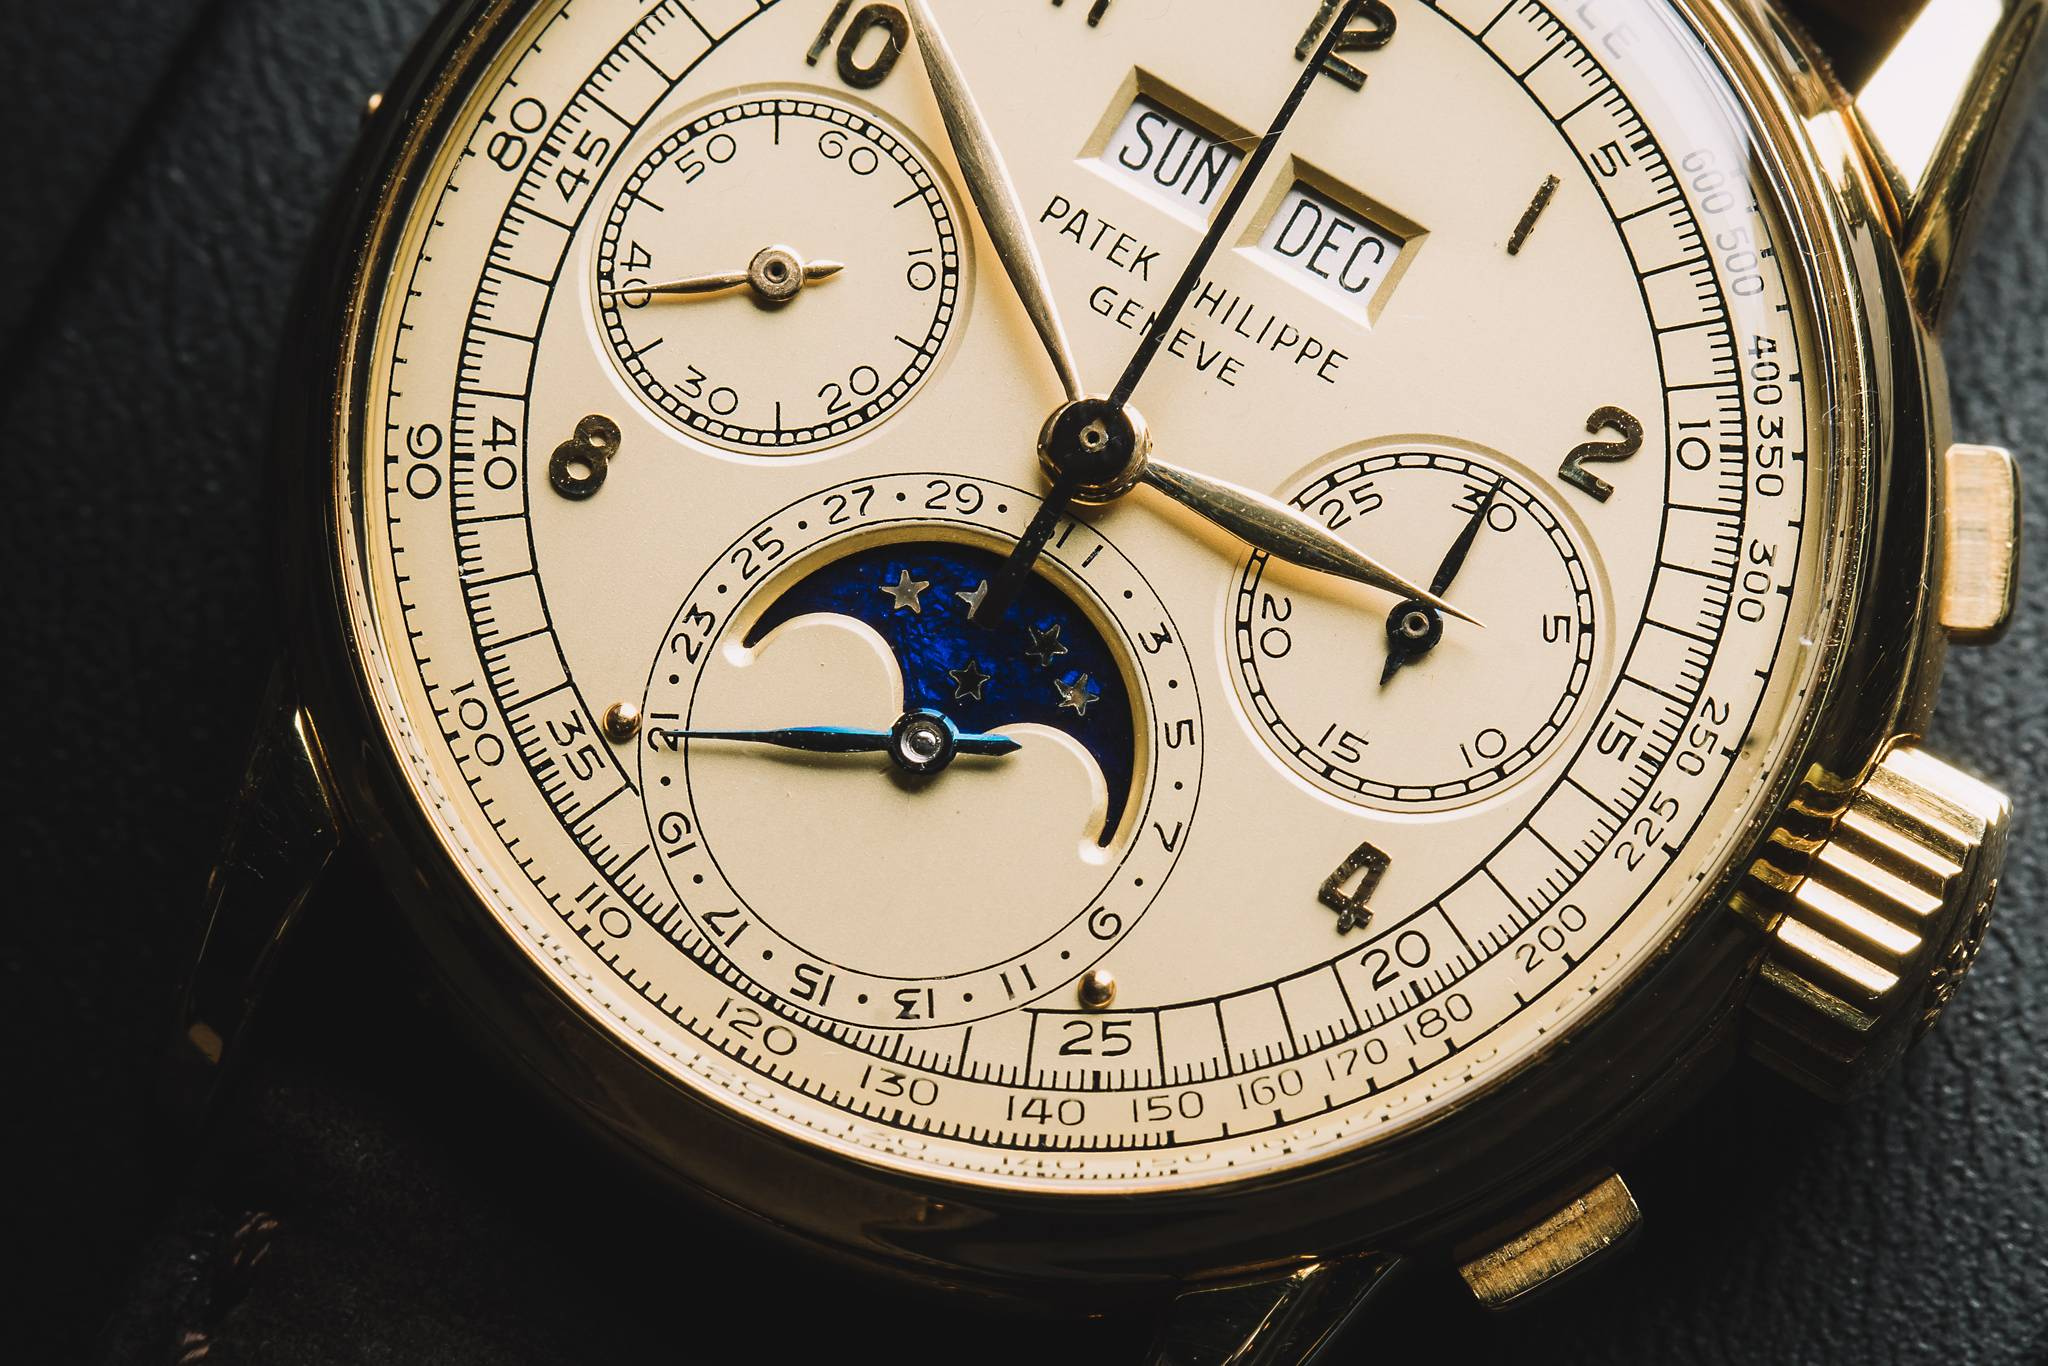 Patek Philippe 2499, 18k yellow gold, 1952 Dial